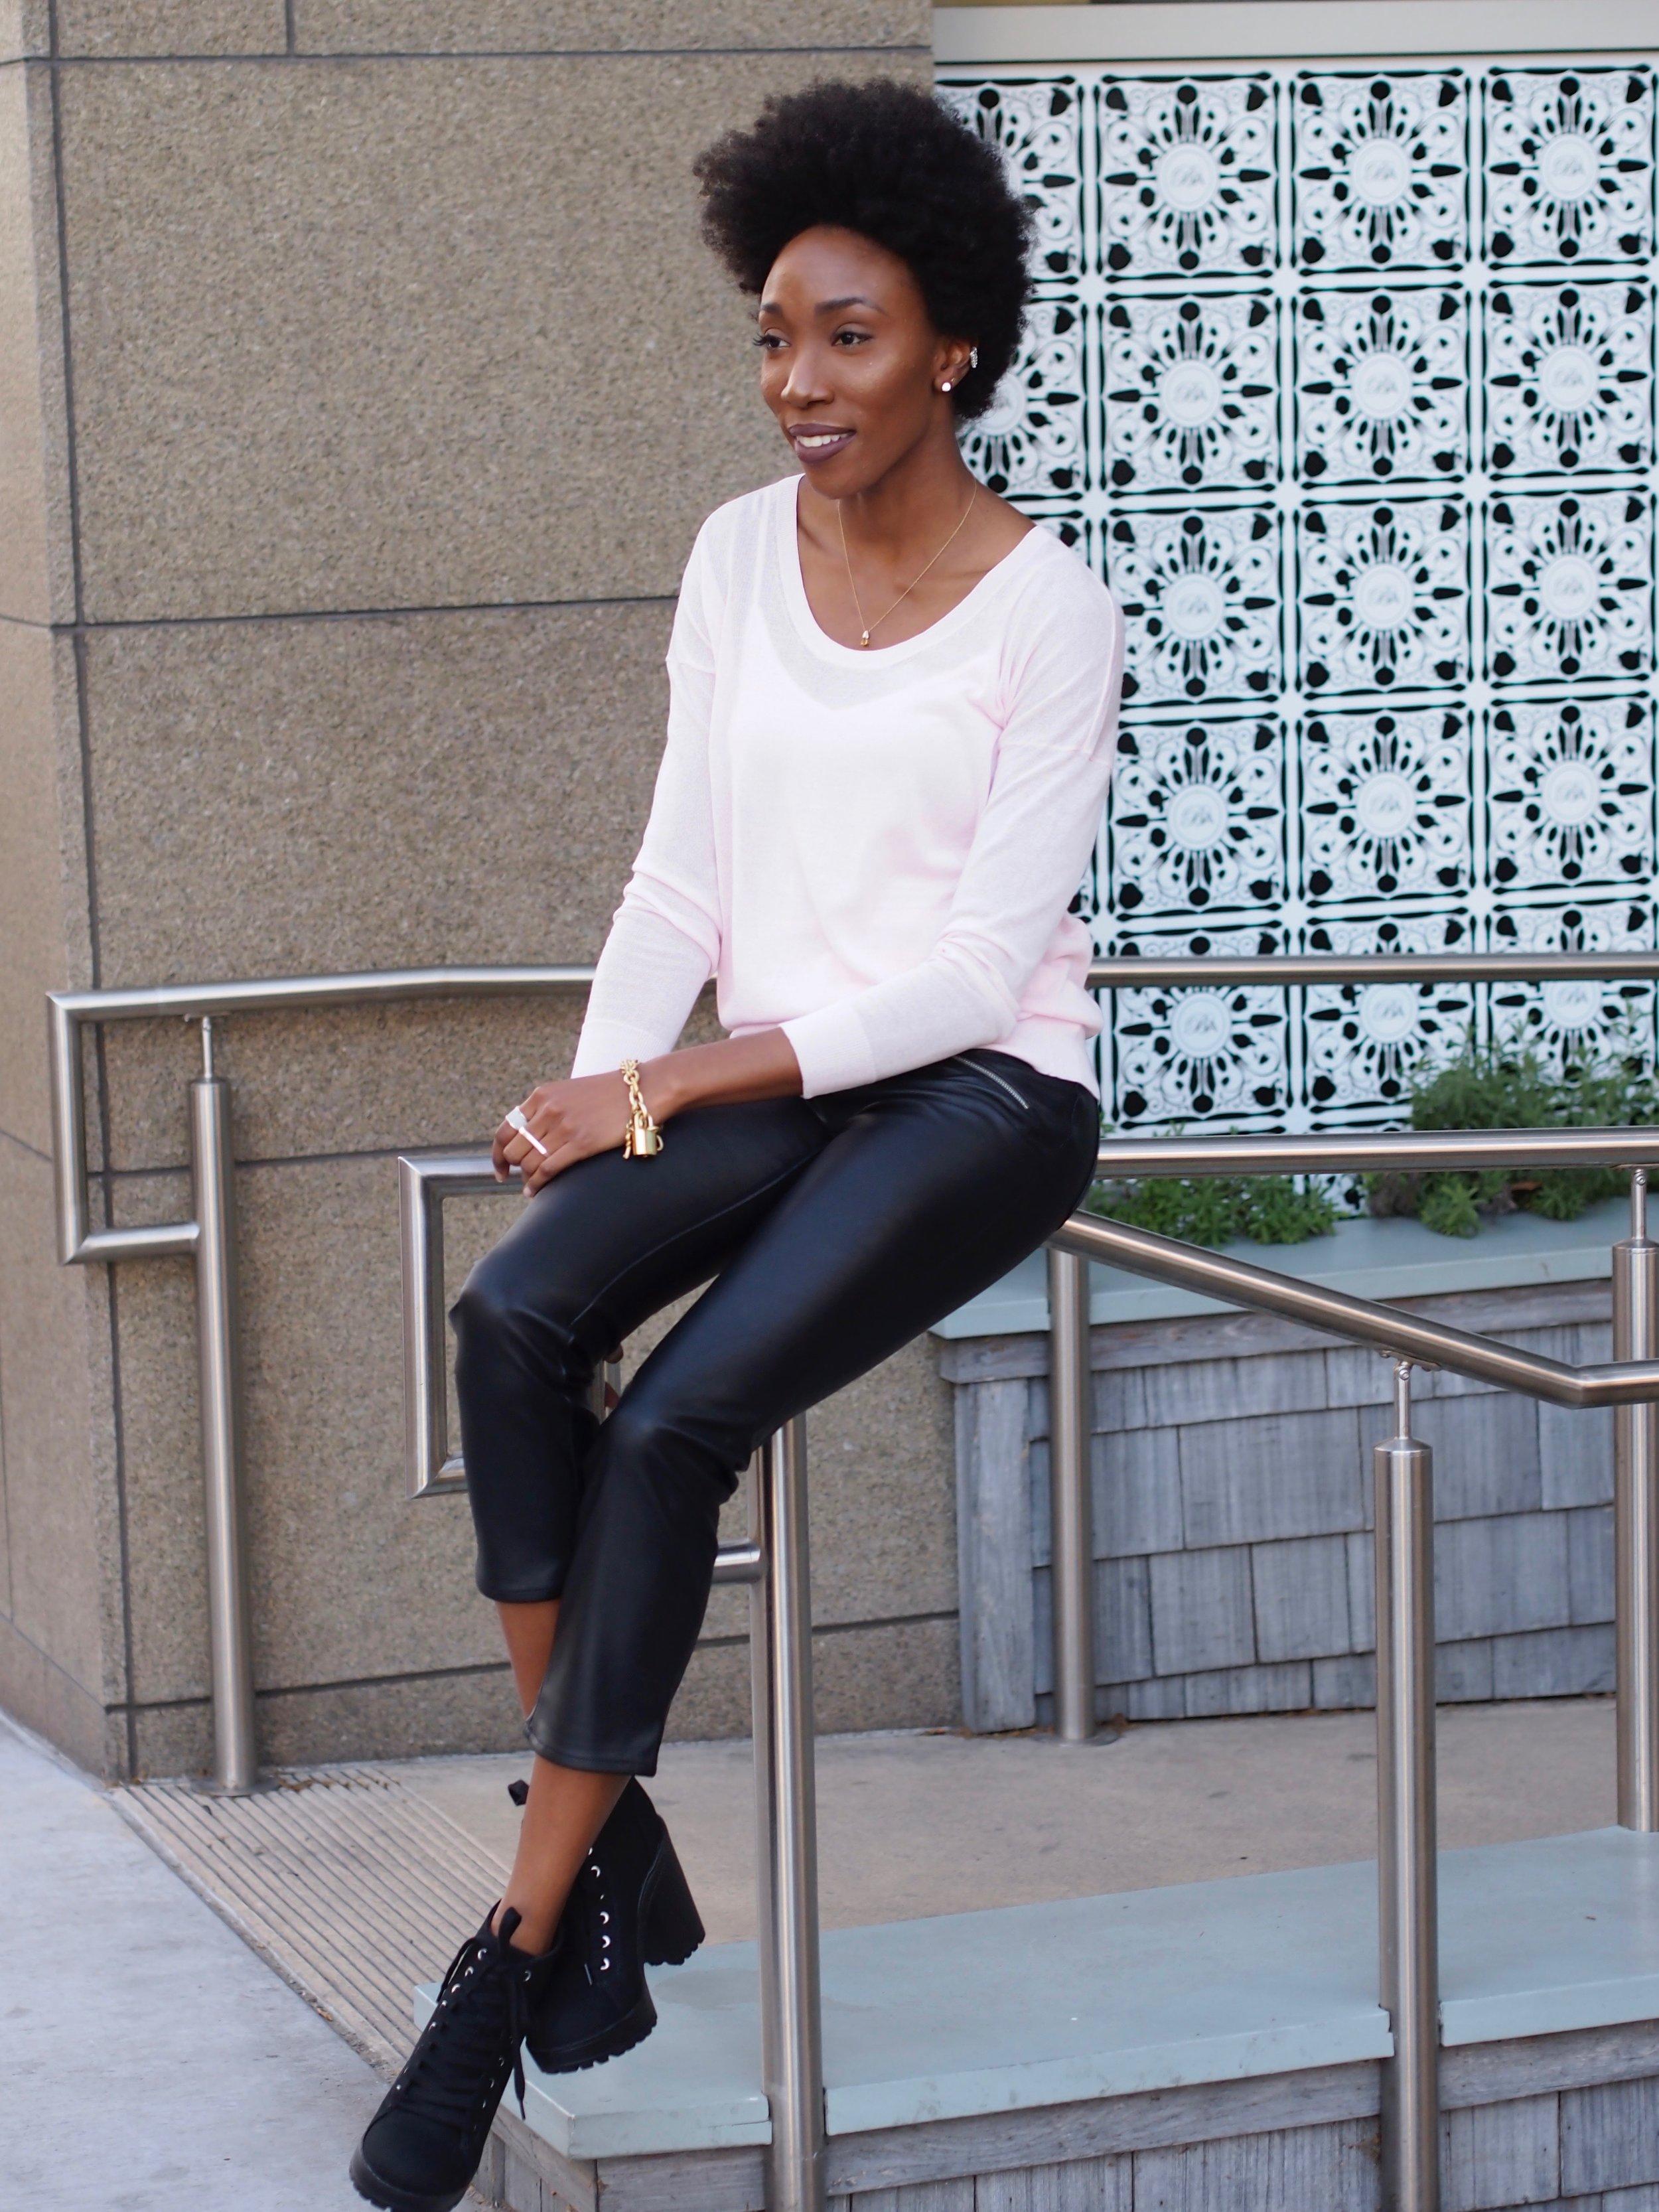 Faux Leather  Pants: H&M  Booties:  H&M   Sweater:  Cabi   Tank:  Cabi   Bracelet:  Cabi